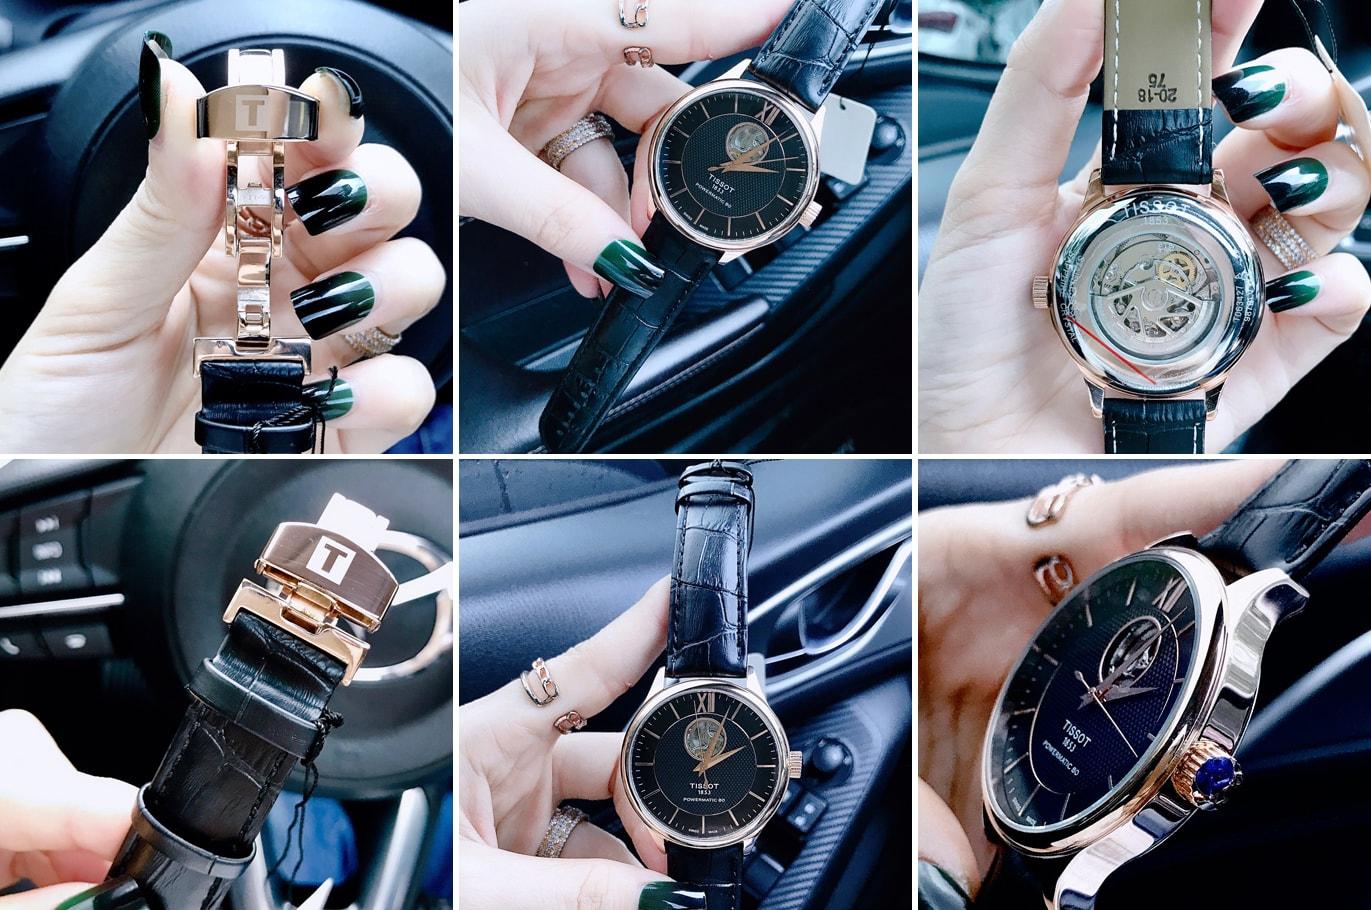 Hinh-anh-thuc-te-dong-ho-TISSOT-co-lo-day-ho-tim-ms-1269900